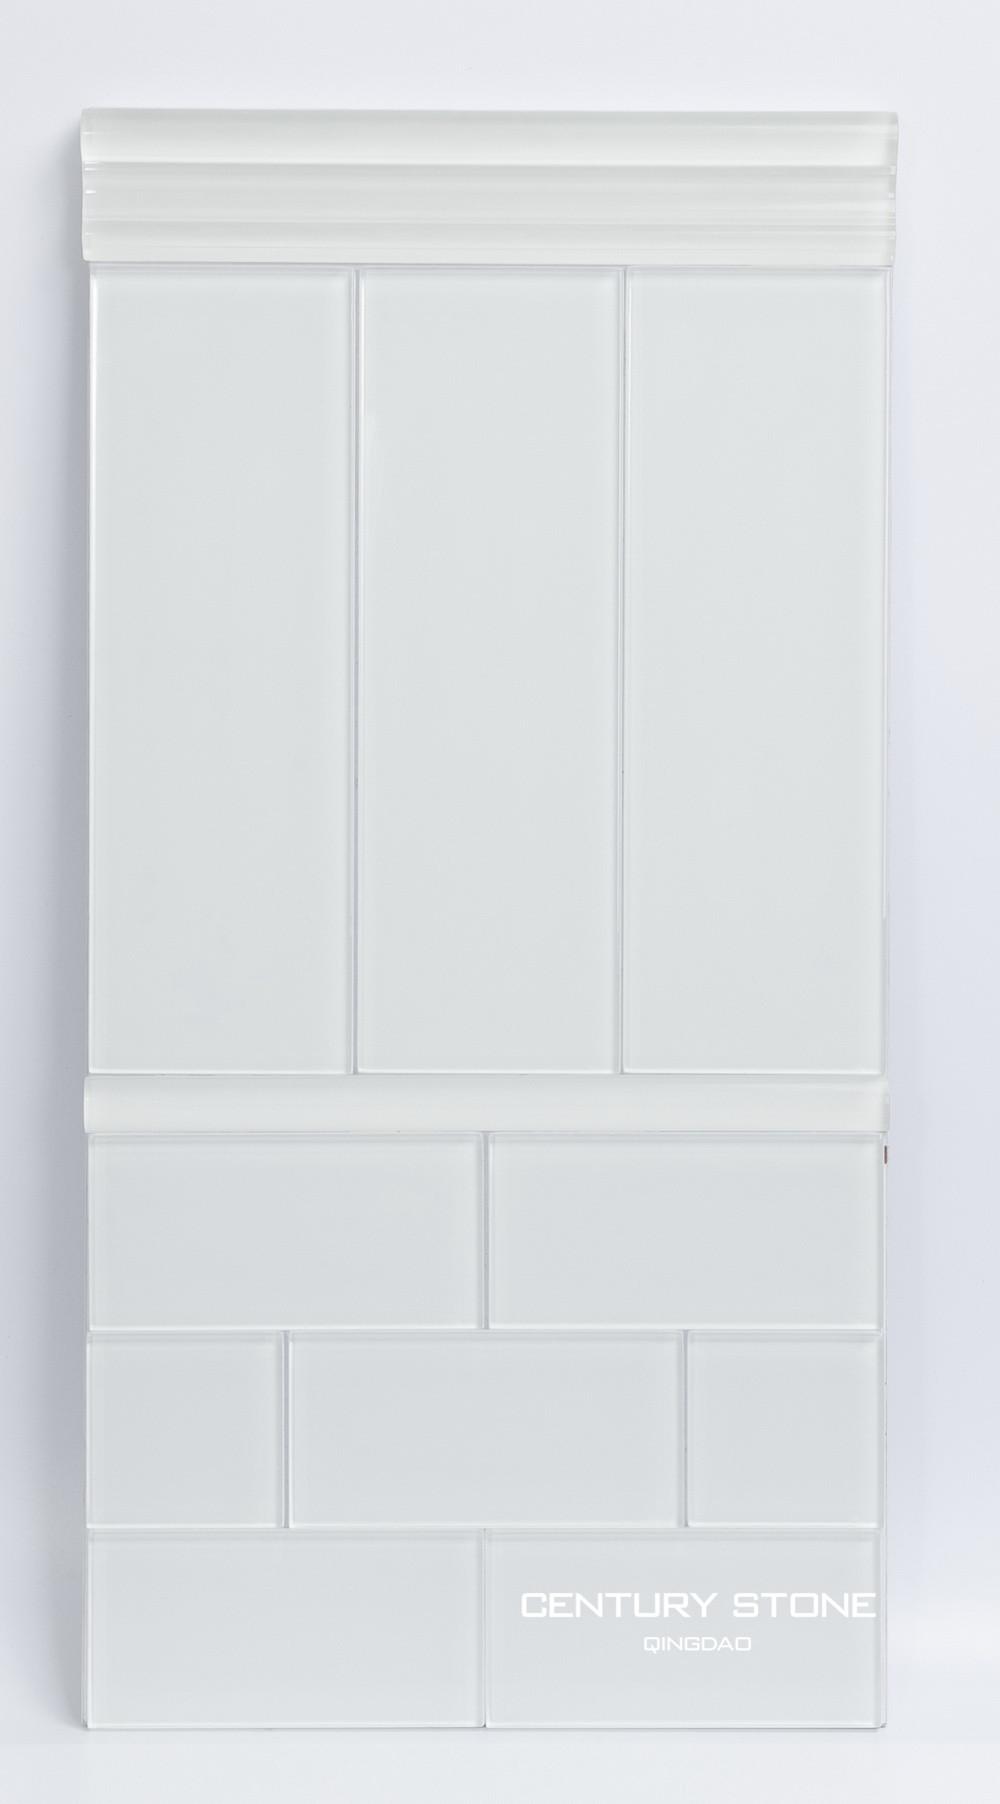 Colorful Crystal Glass Liner Pencil Tile For Bathroom Wall Border ...